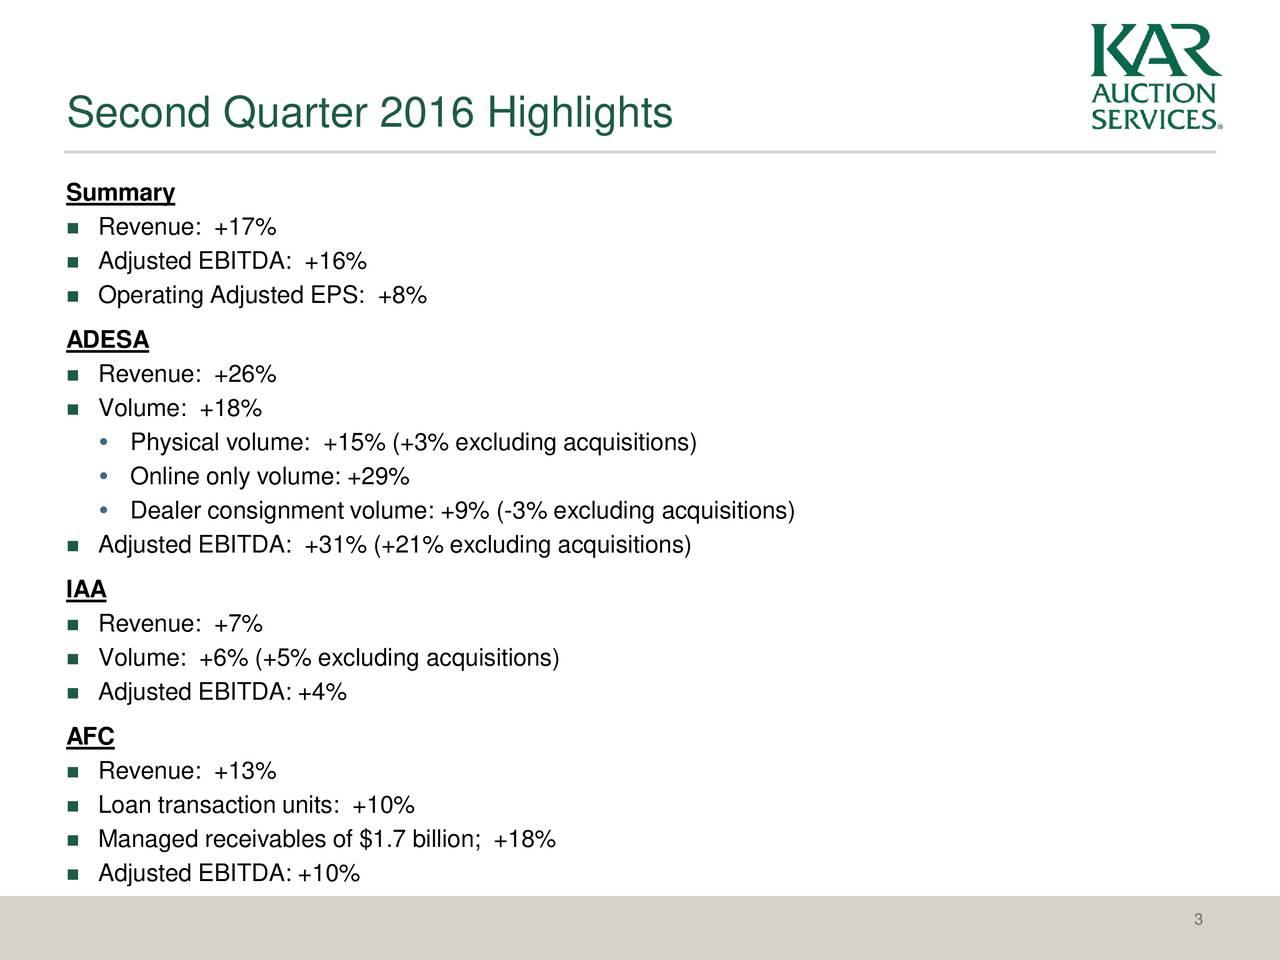 Summary Revenue: +17% Adjusted EBITDA: +16% Operating Adjusted EPS: +8% ADESA Revenue: +26% Volume: +18% Physical volume: +15% (+3% excluding acquisitions) Online only volume: +29% Dealer consignment volume: +9% (-3% excluding acquisitions) Adjusted EBITDA: +31% (+21% excluding acquisitions) IAA Revenue: +7% Volume: +6% (+5% excluding acquisitions) Adjusted EBITDA: +4% AFC Revenue: +13% Loan transaction units: +10% Managed receivables of $1.7 billion; +18% Adjusted EBITDA: +10% 3